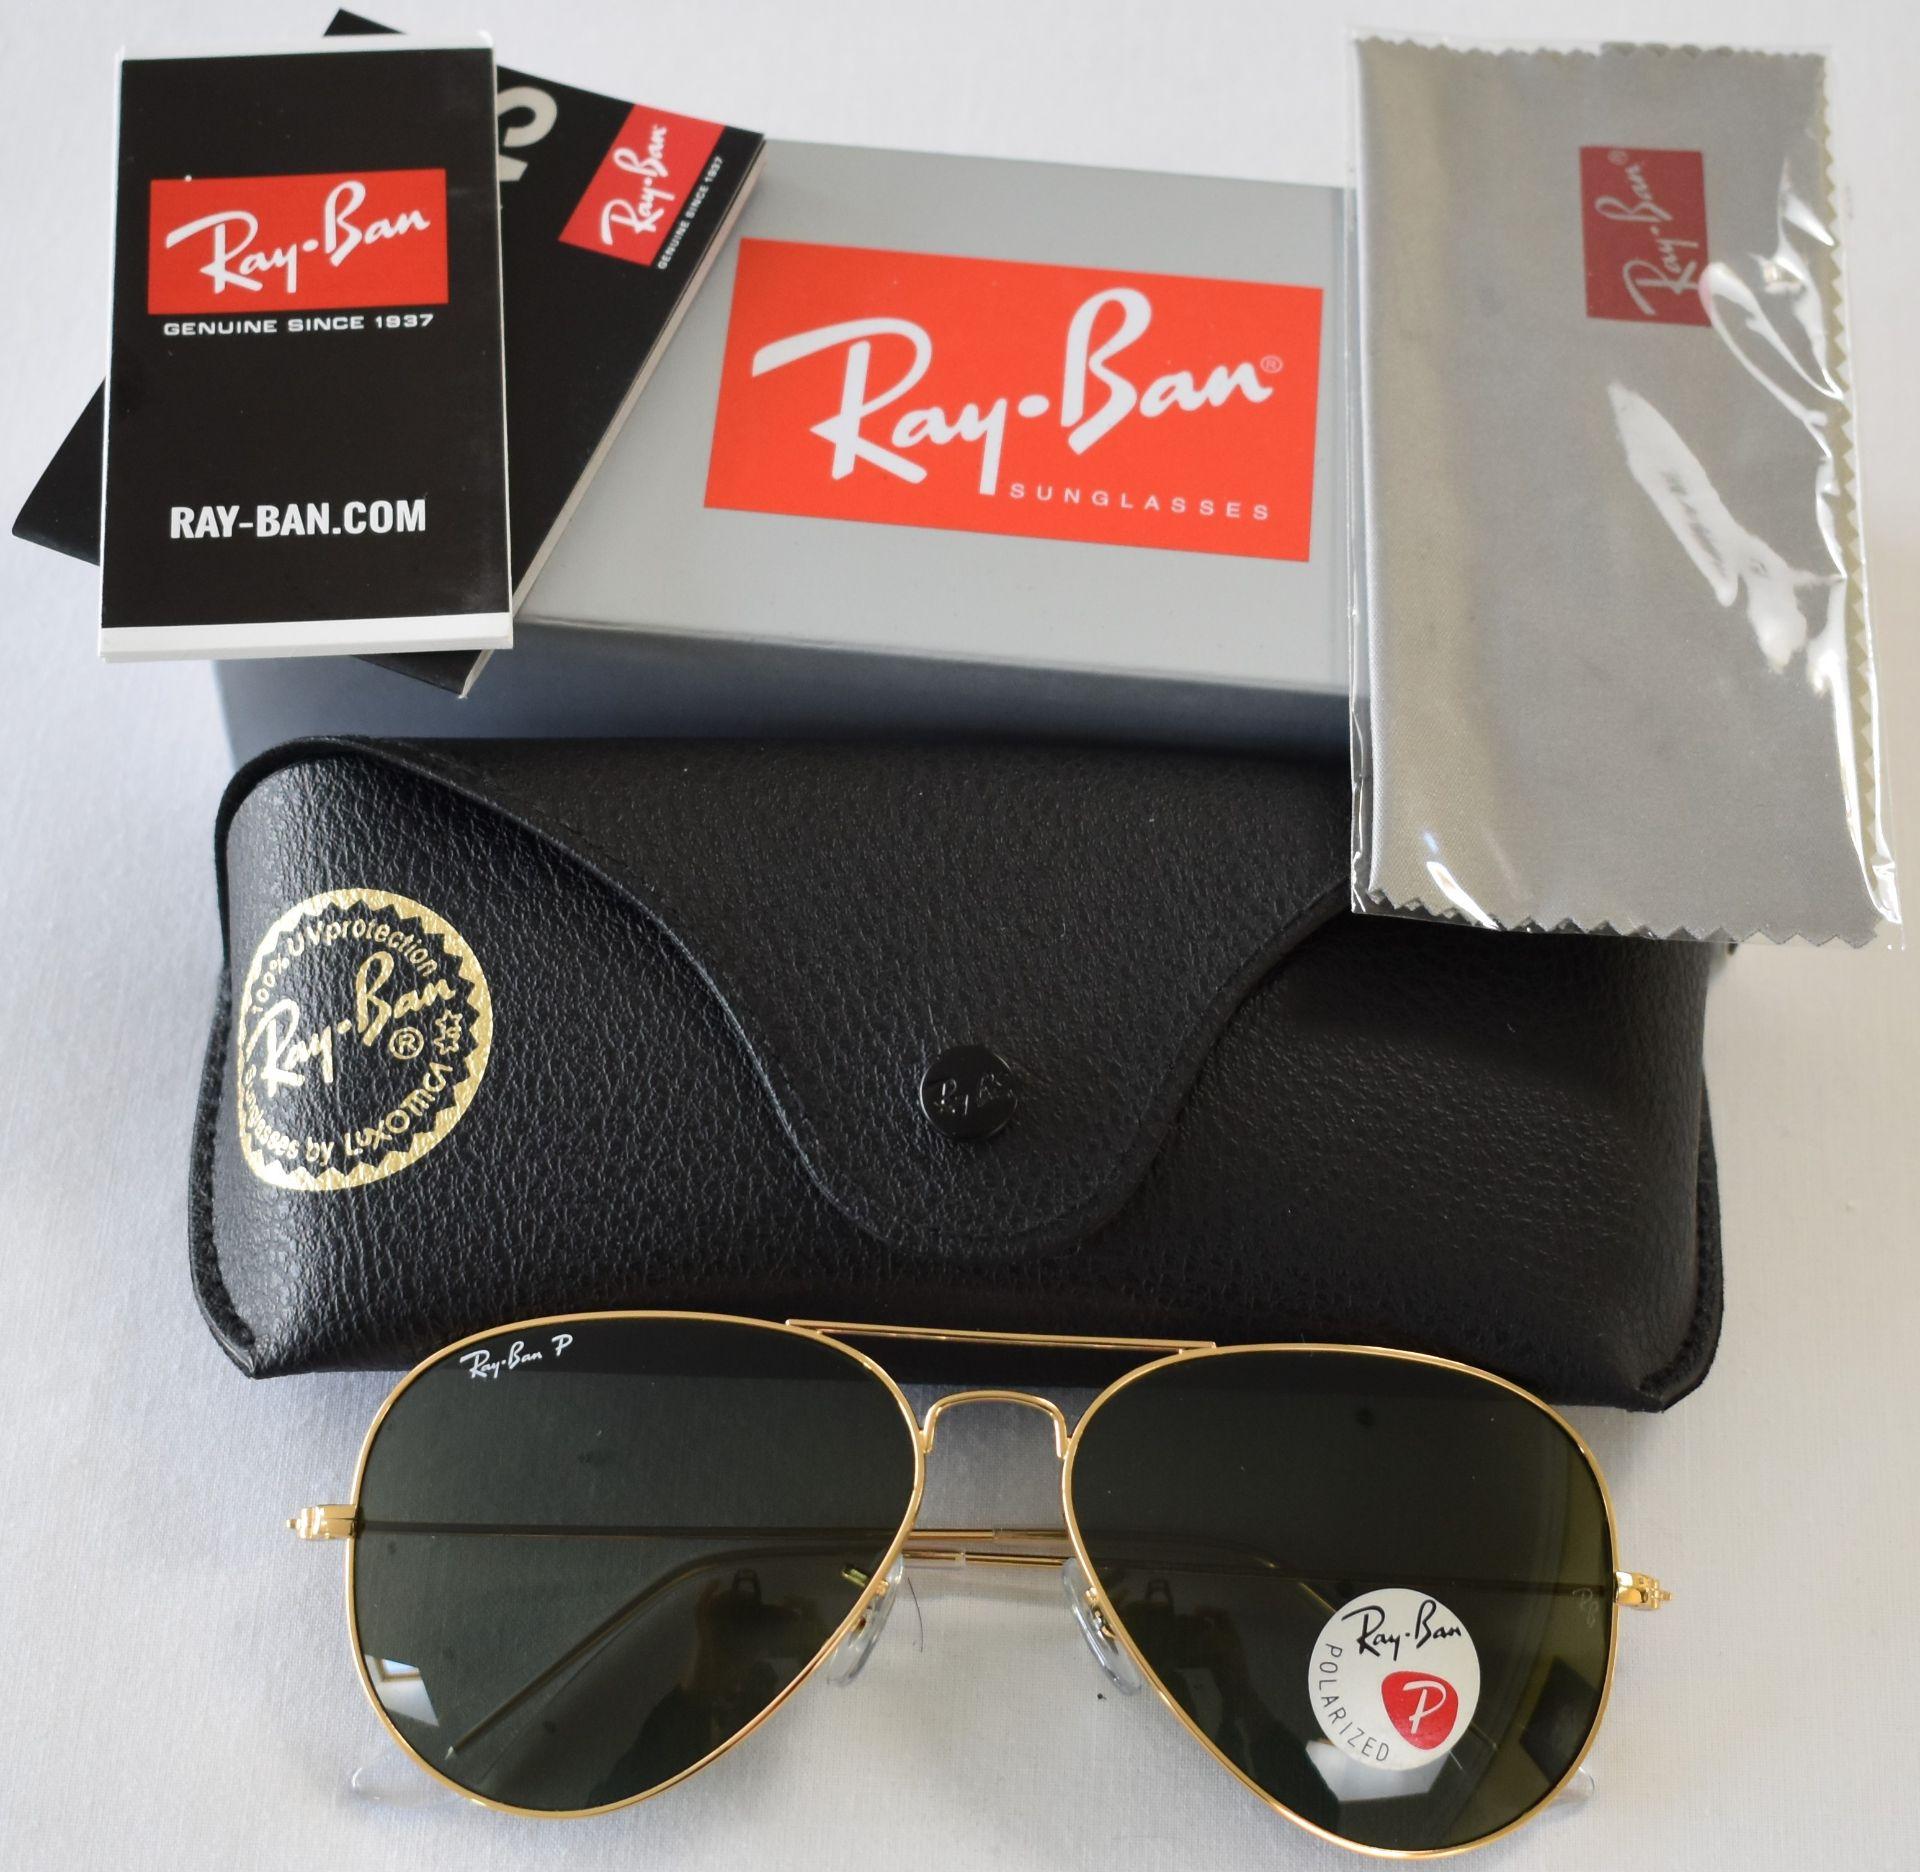 Ray Ban Sunglasses ORB3025 001/58 *3P